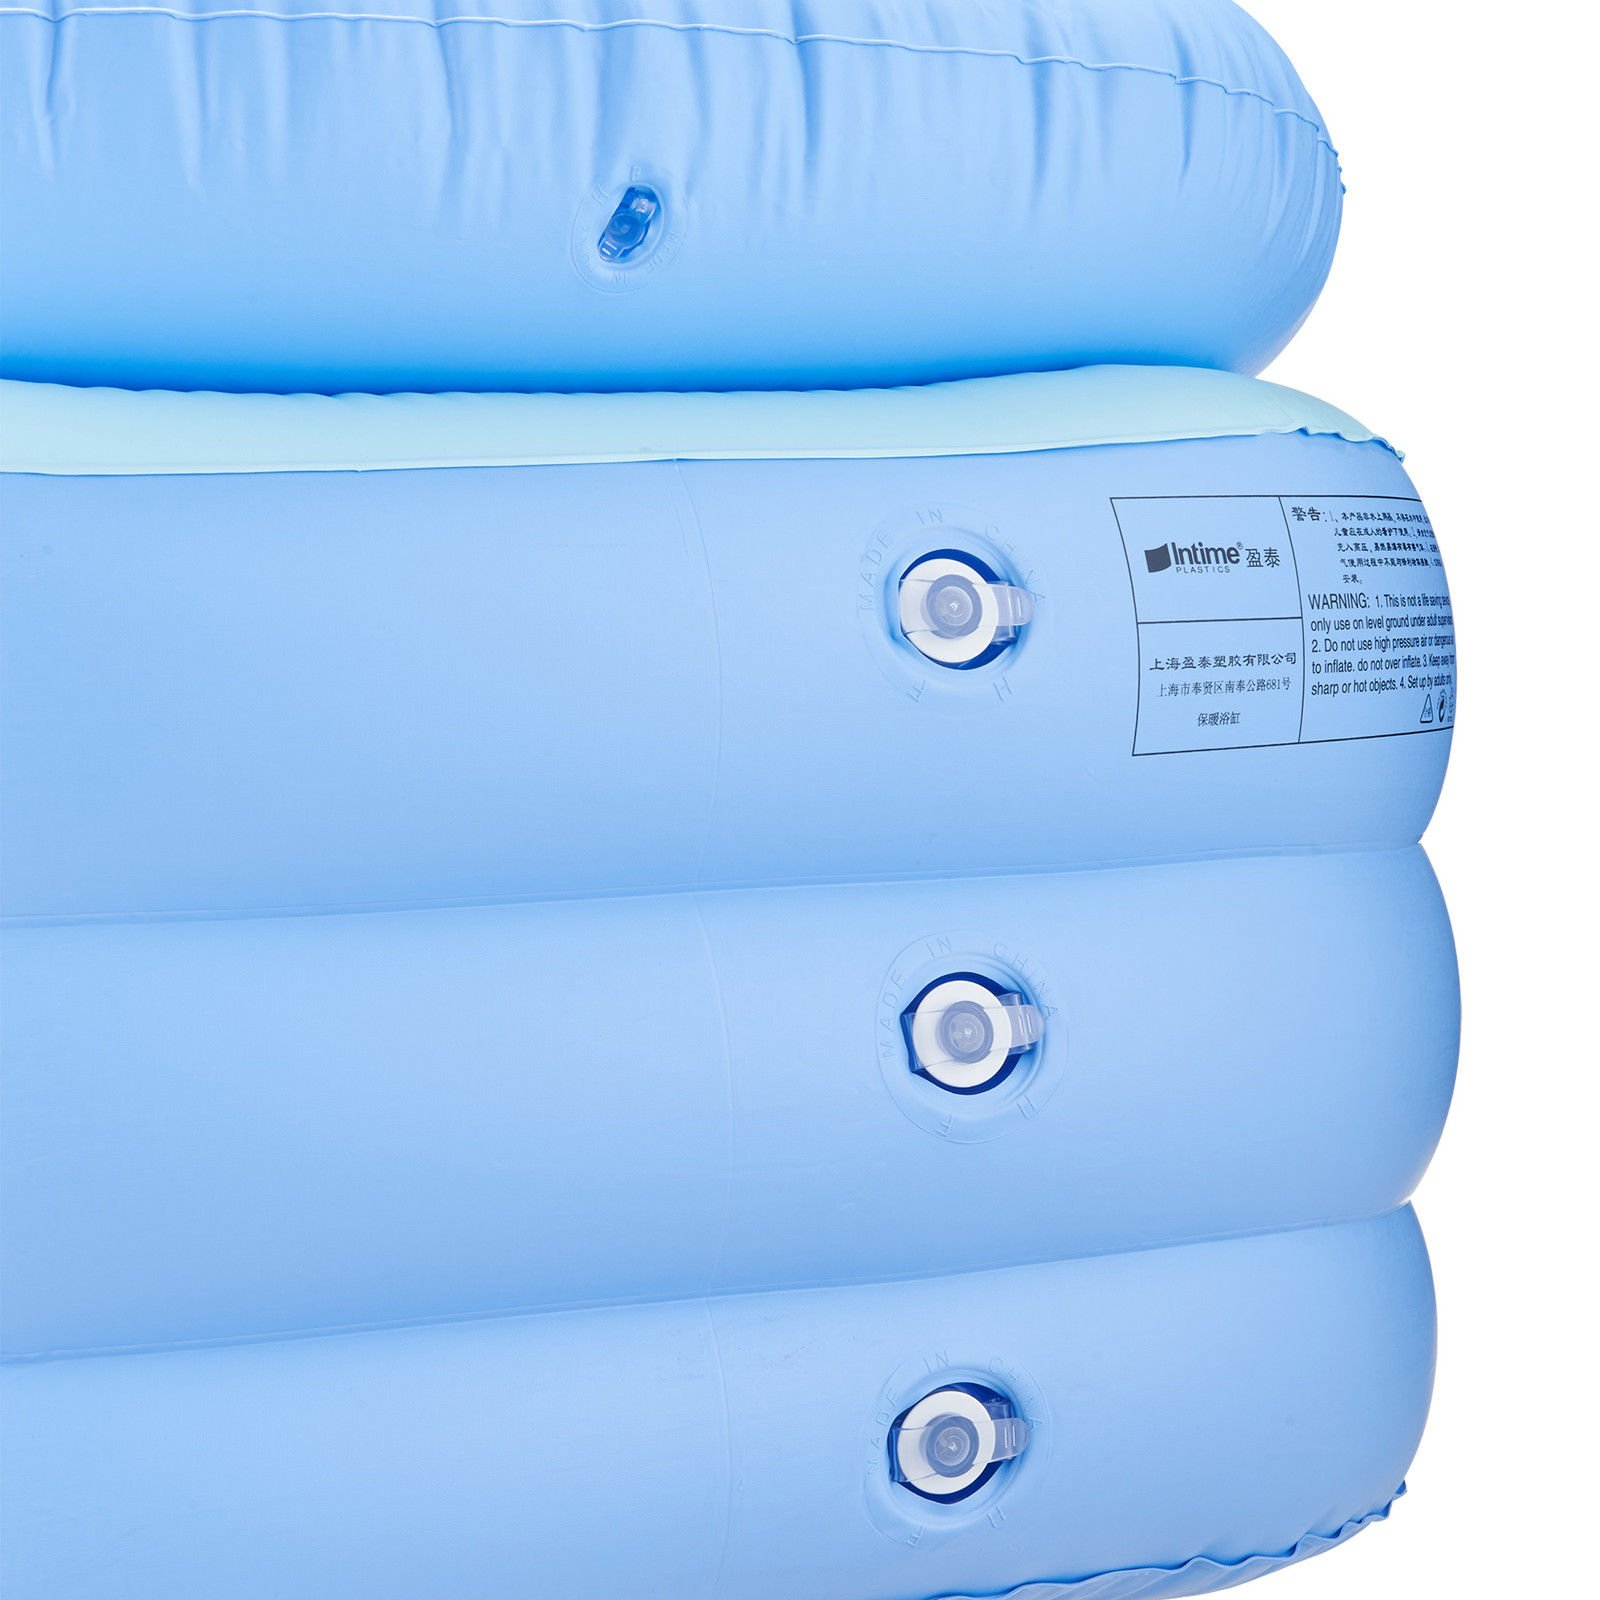 LZHQT Blow Up Adult PVC Folding Portable Foldable Bathtub Inflatable Bath Tub Air Pump by LZHQT (Image #8)